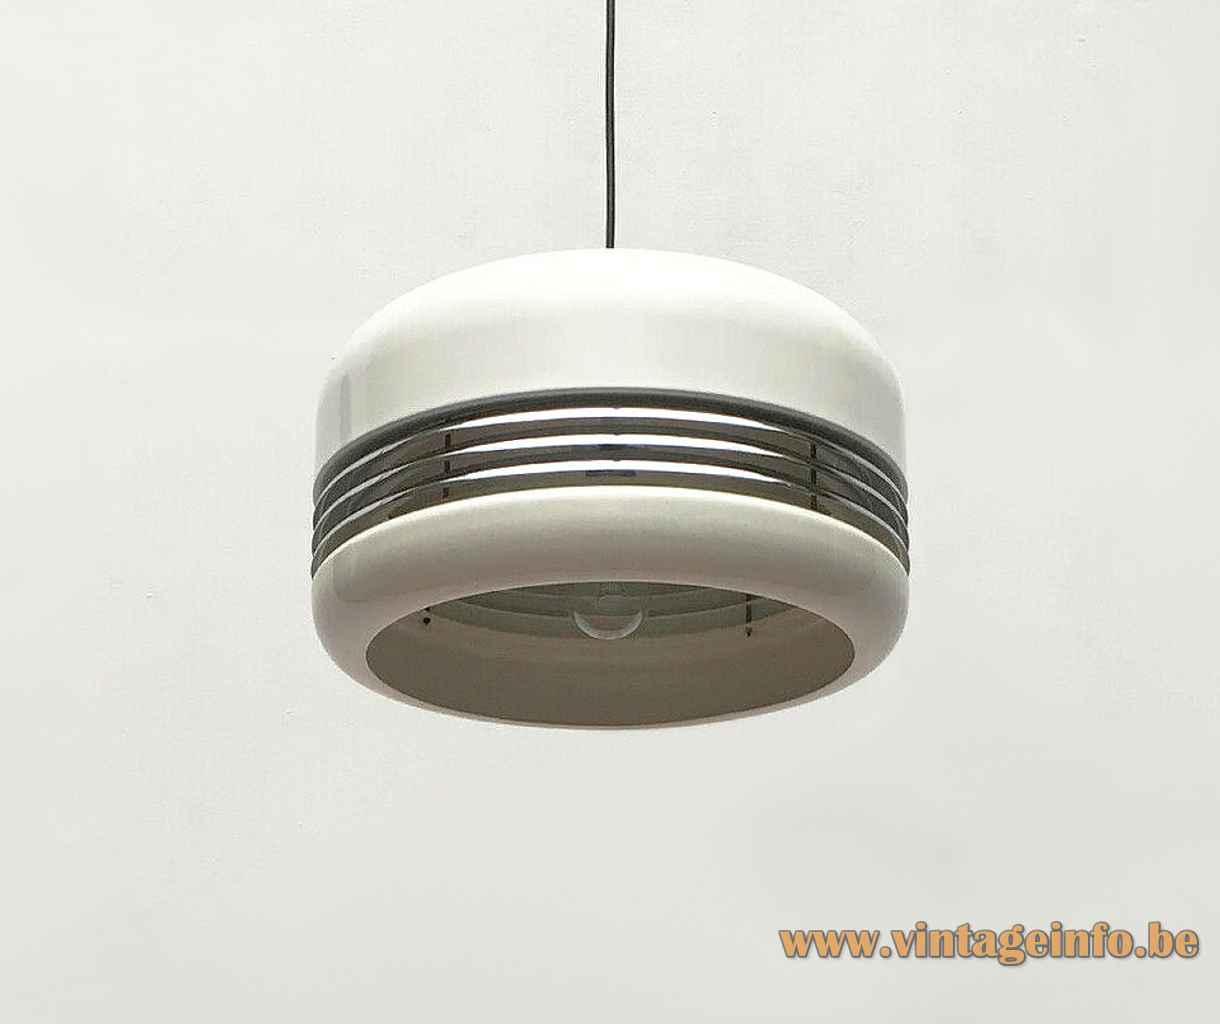 Staff pendant lamp 5526 round white aluminium lampshade chrome ring slats 1970s Germany E27 socket 5525